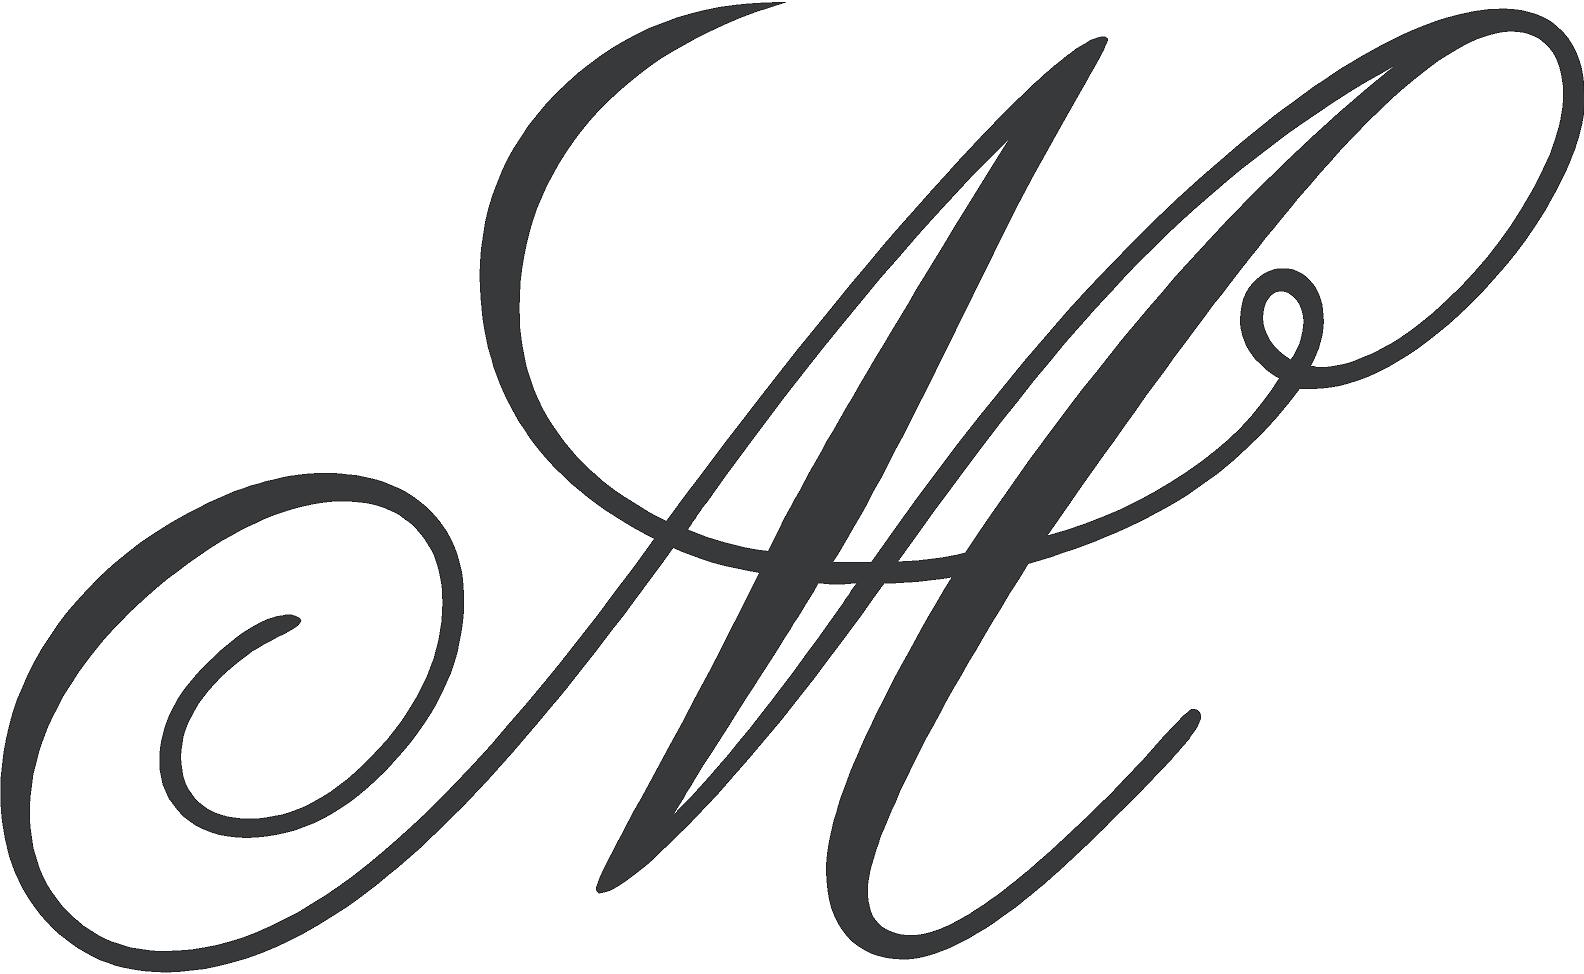 Fancy Cursive Letter M Drawing Free Image